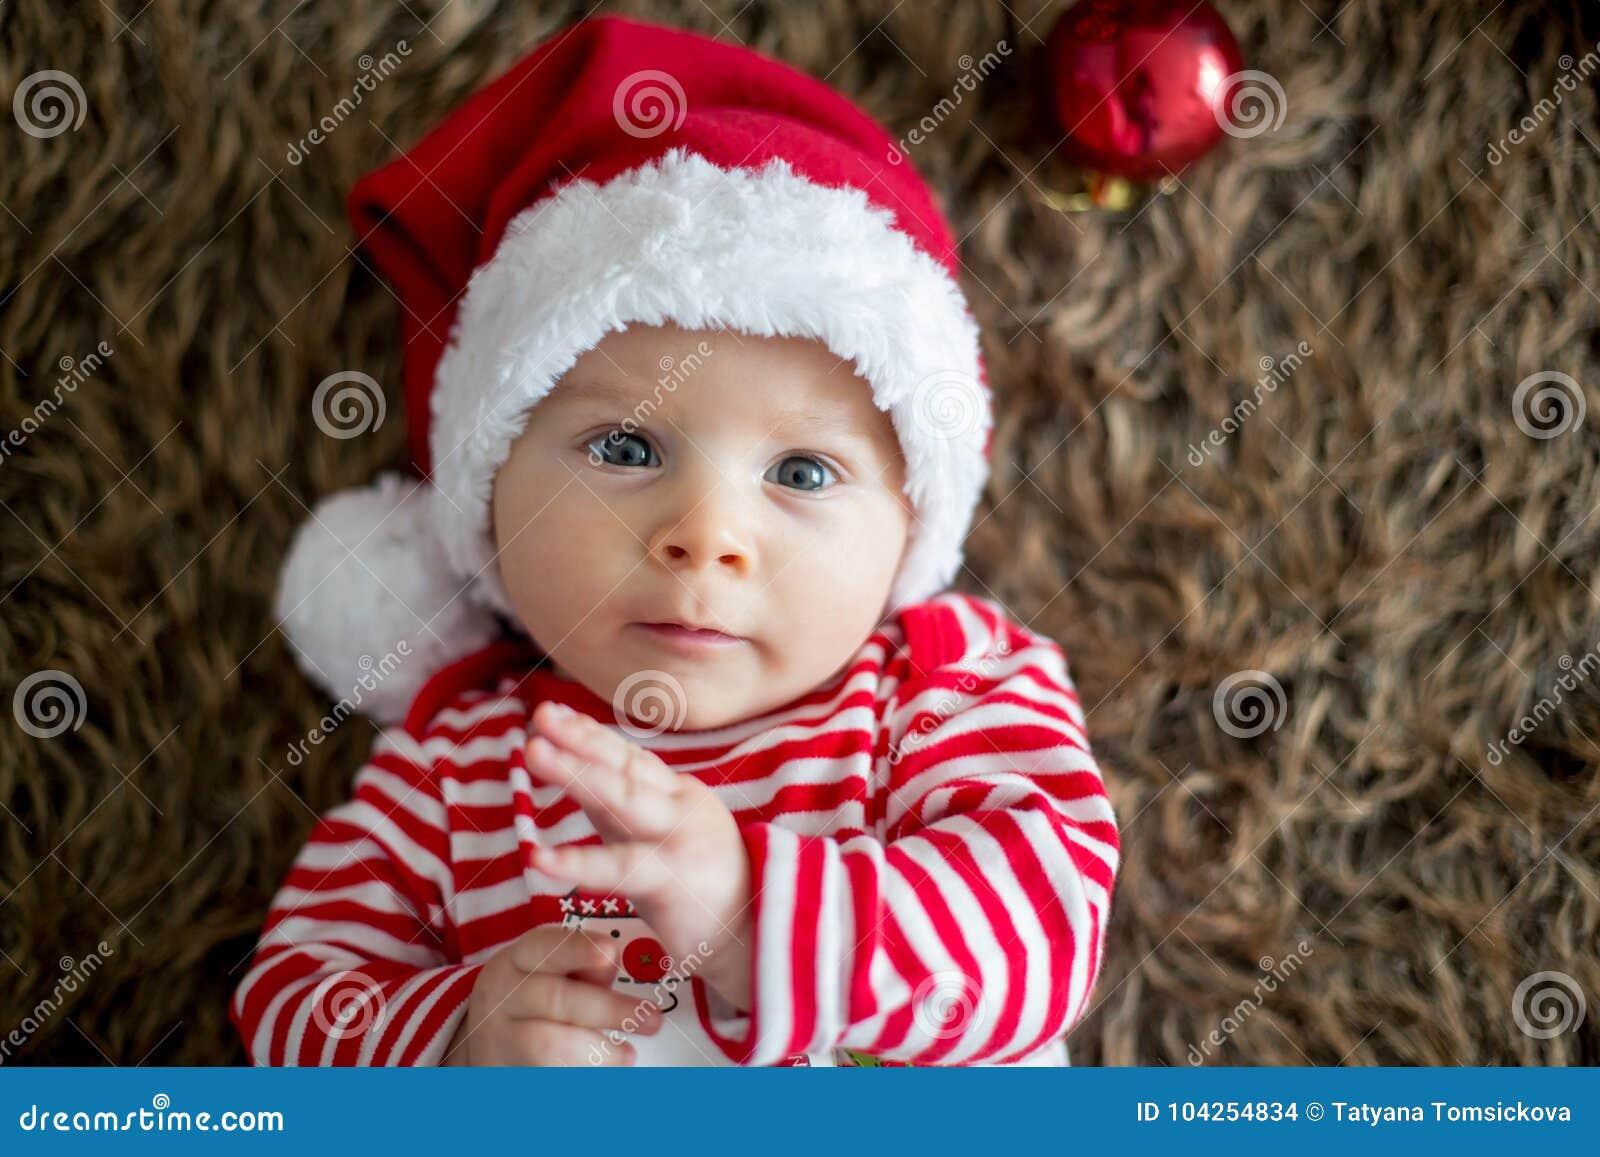 fcf7a4d0265b7 Christmas Portrait Of Cute Little Newborn Baby Boy Stock Photo ...